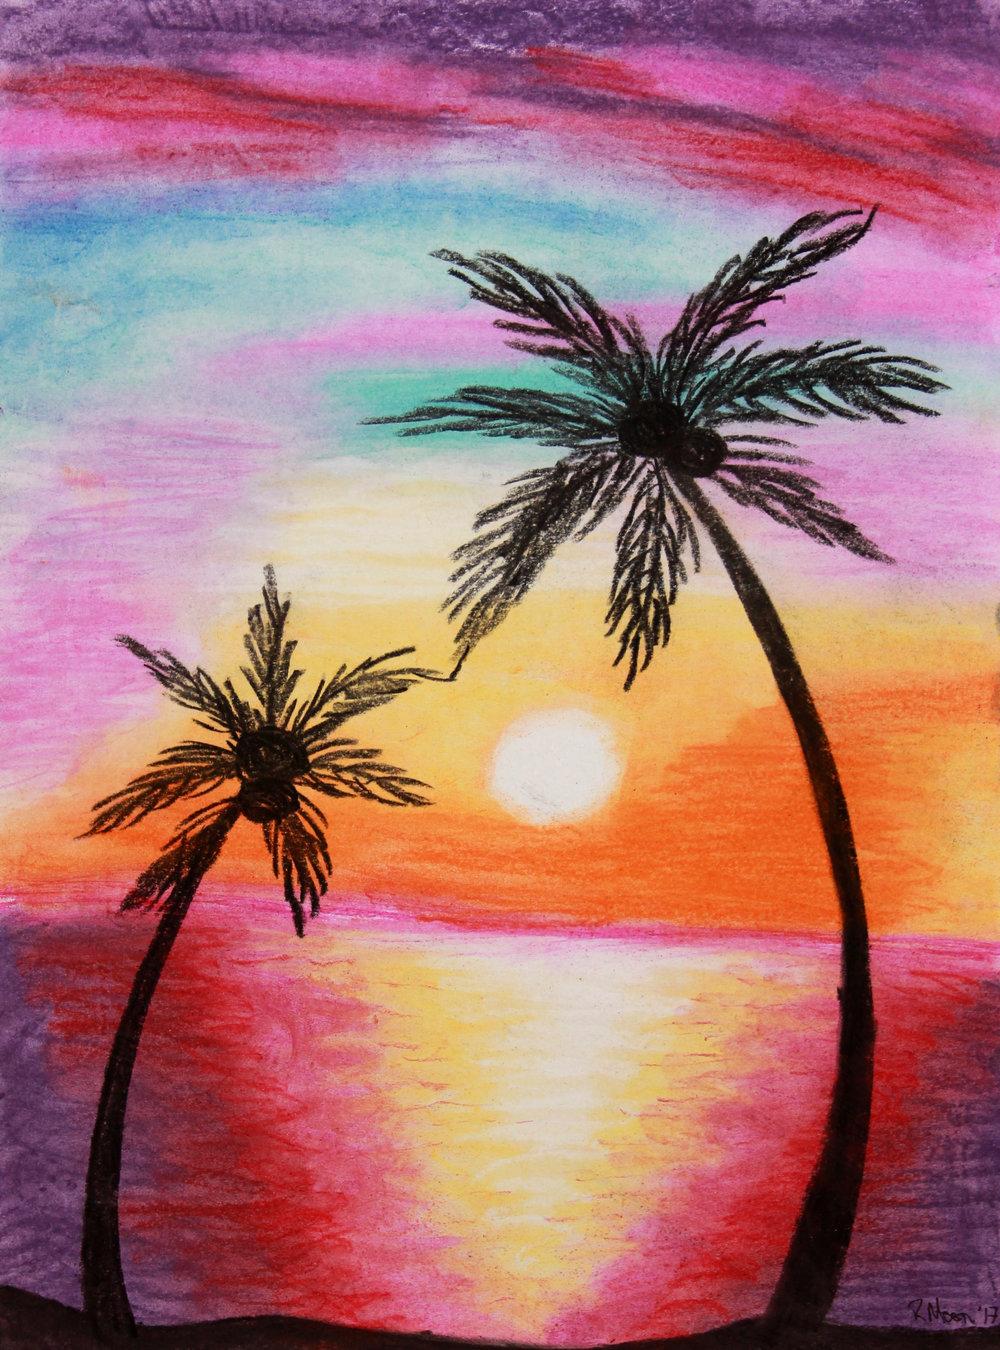 Roanna-Tropic Sunset.jpg